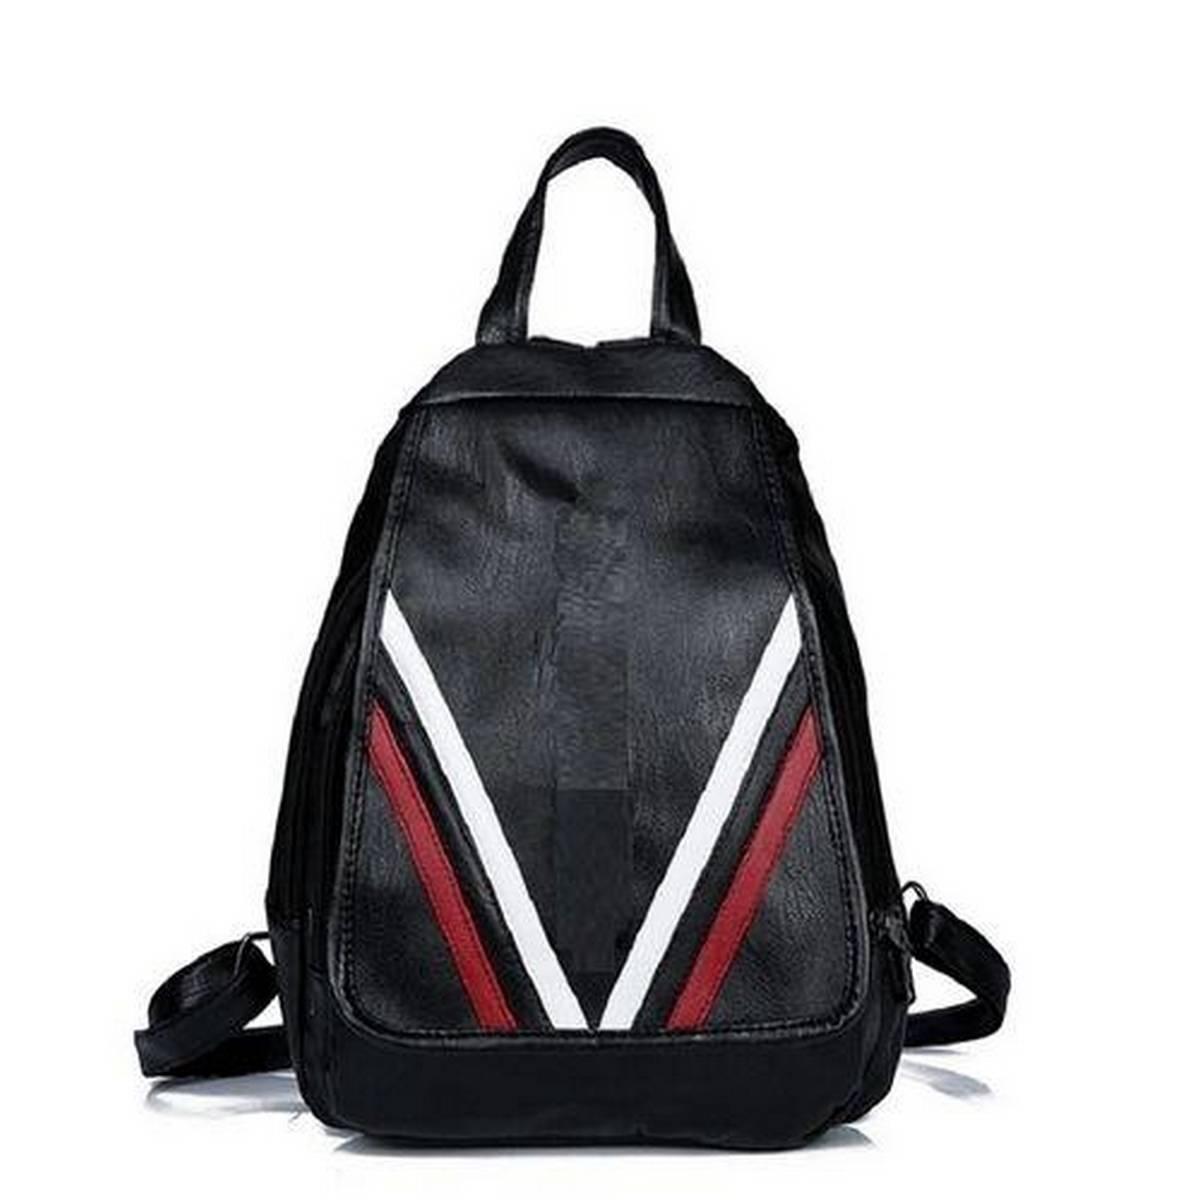 Black Artificial Leather Shoulder & Hand Carry Bag For Women